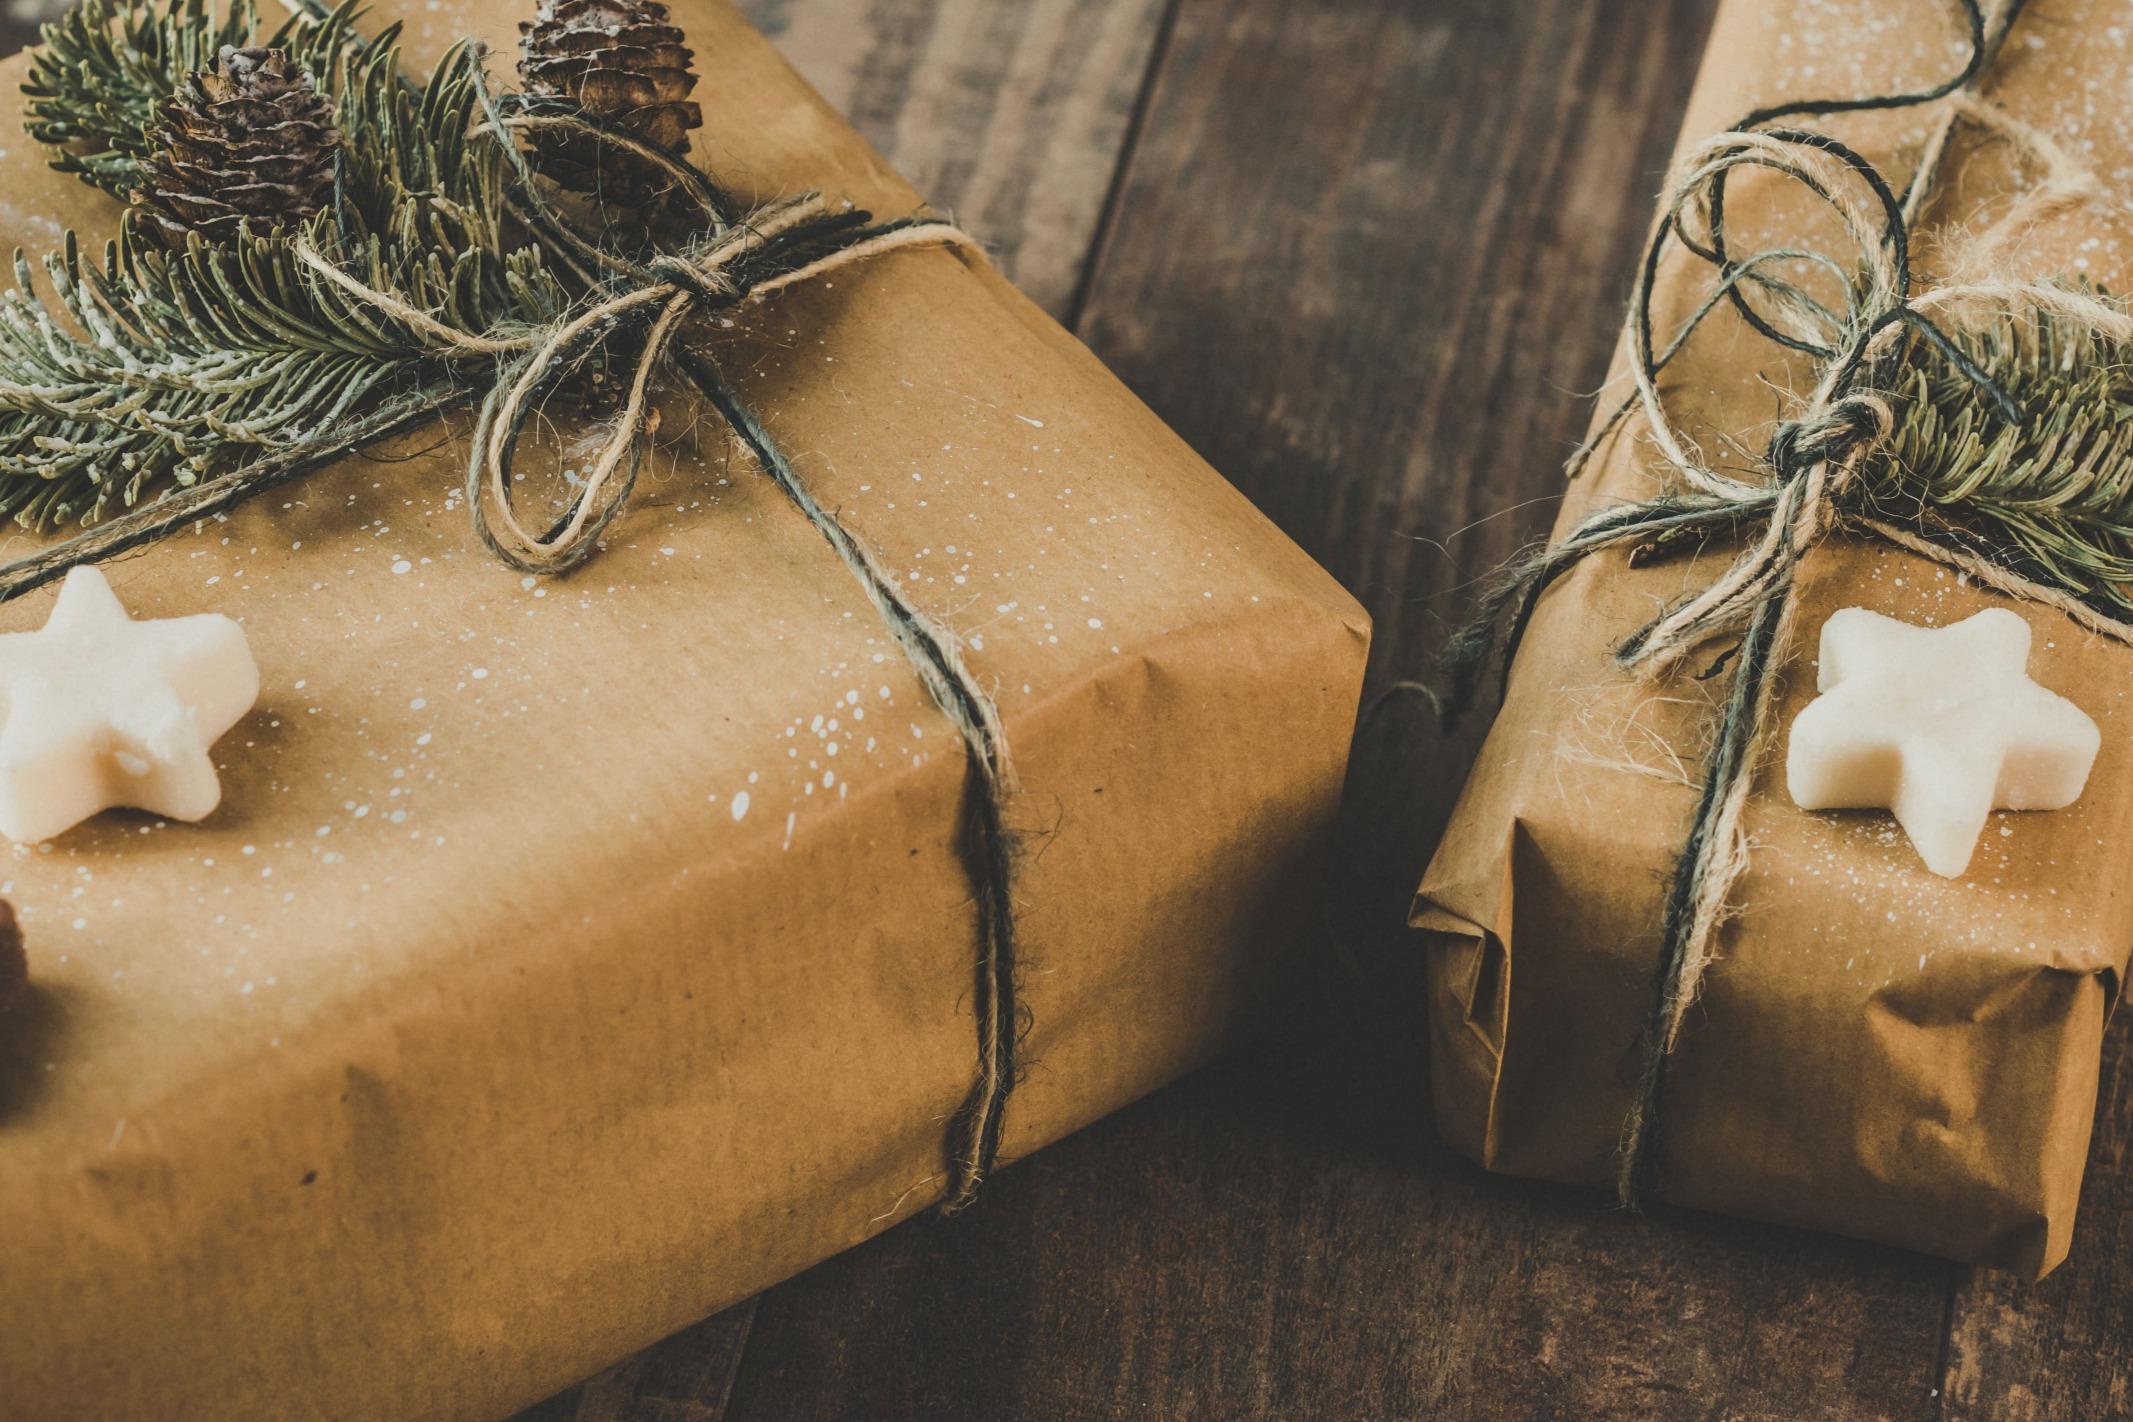 Cadeaux de Noël emballés